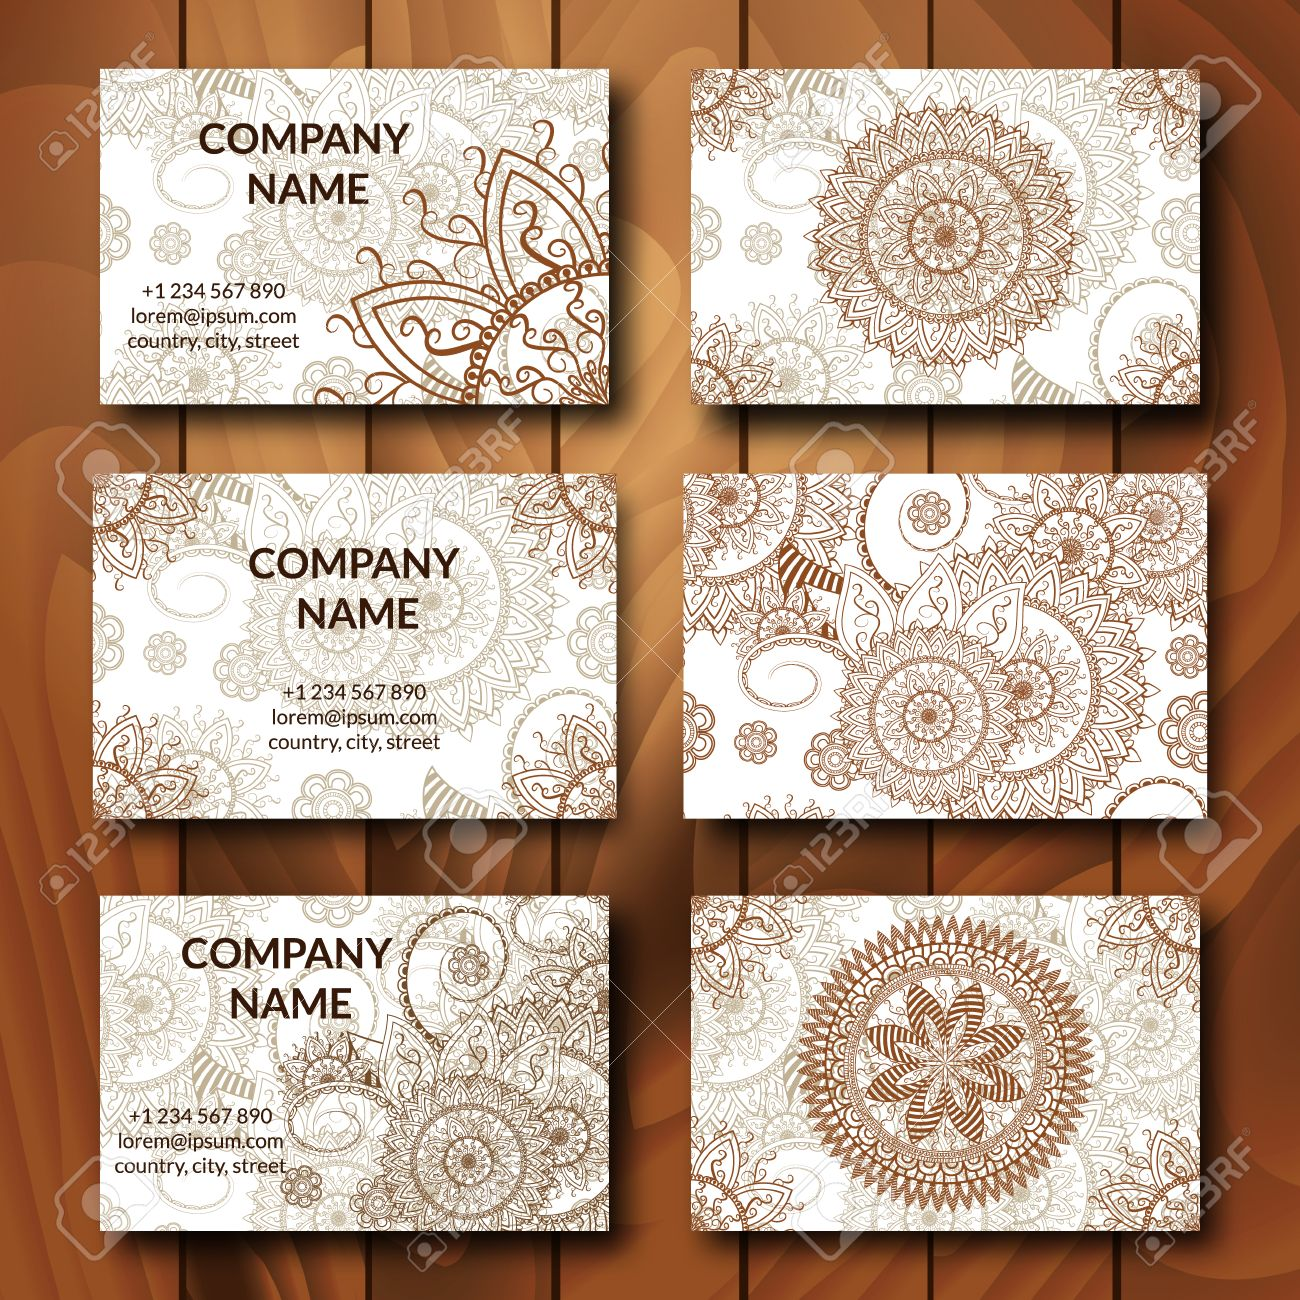 Vintage business cards set ornamental mandala indian arabic vintage business cards set ornamental mandala indian arabic ornaments mehndi henna tattoo magicingreecefo Gallery